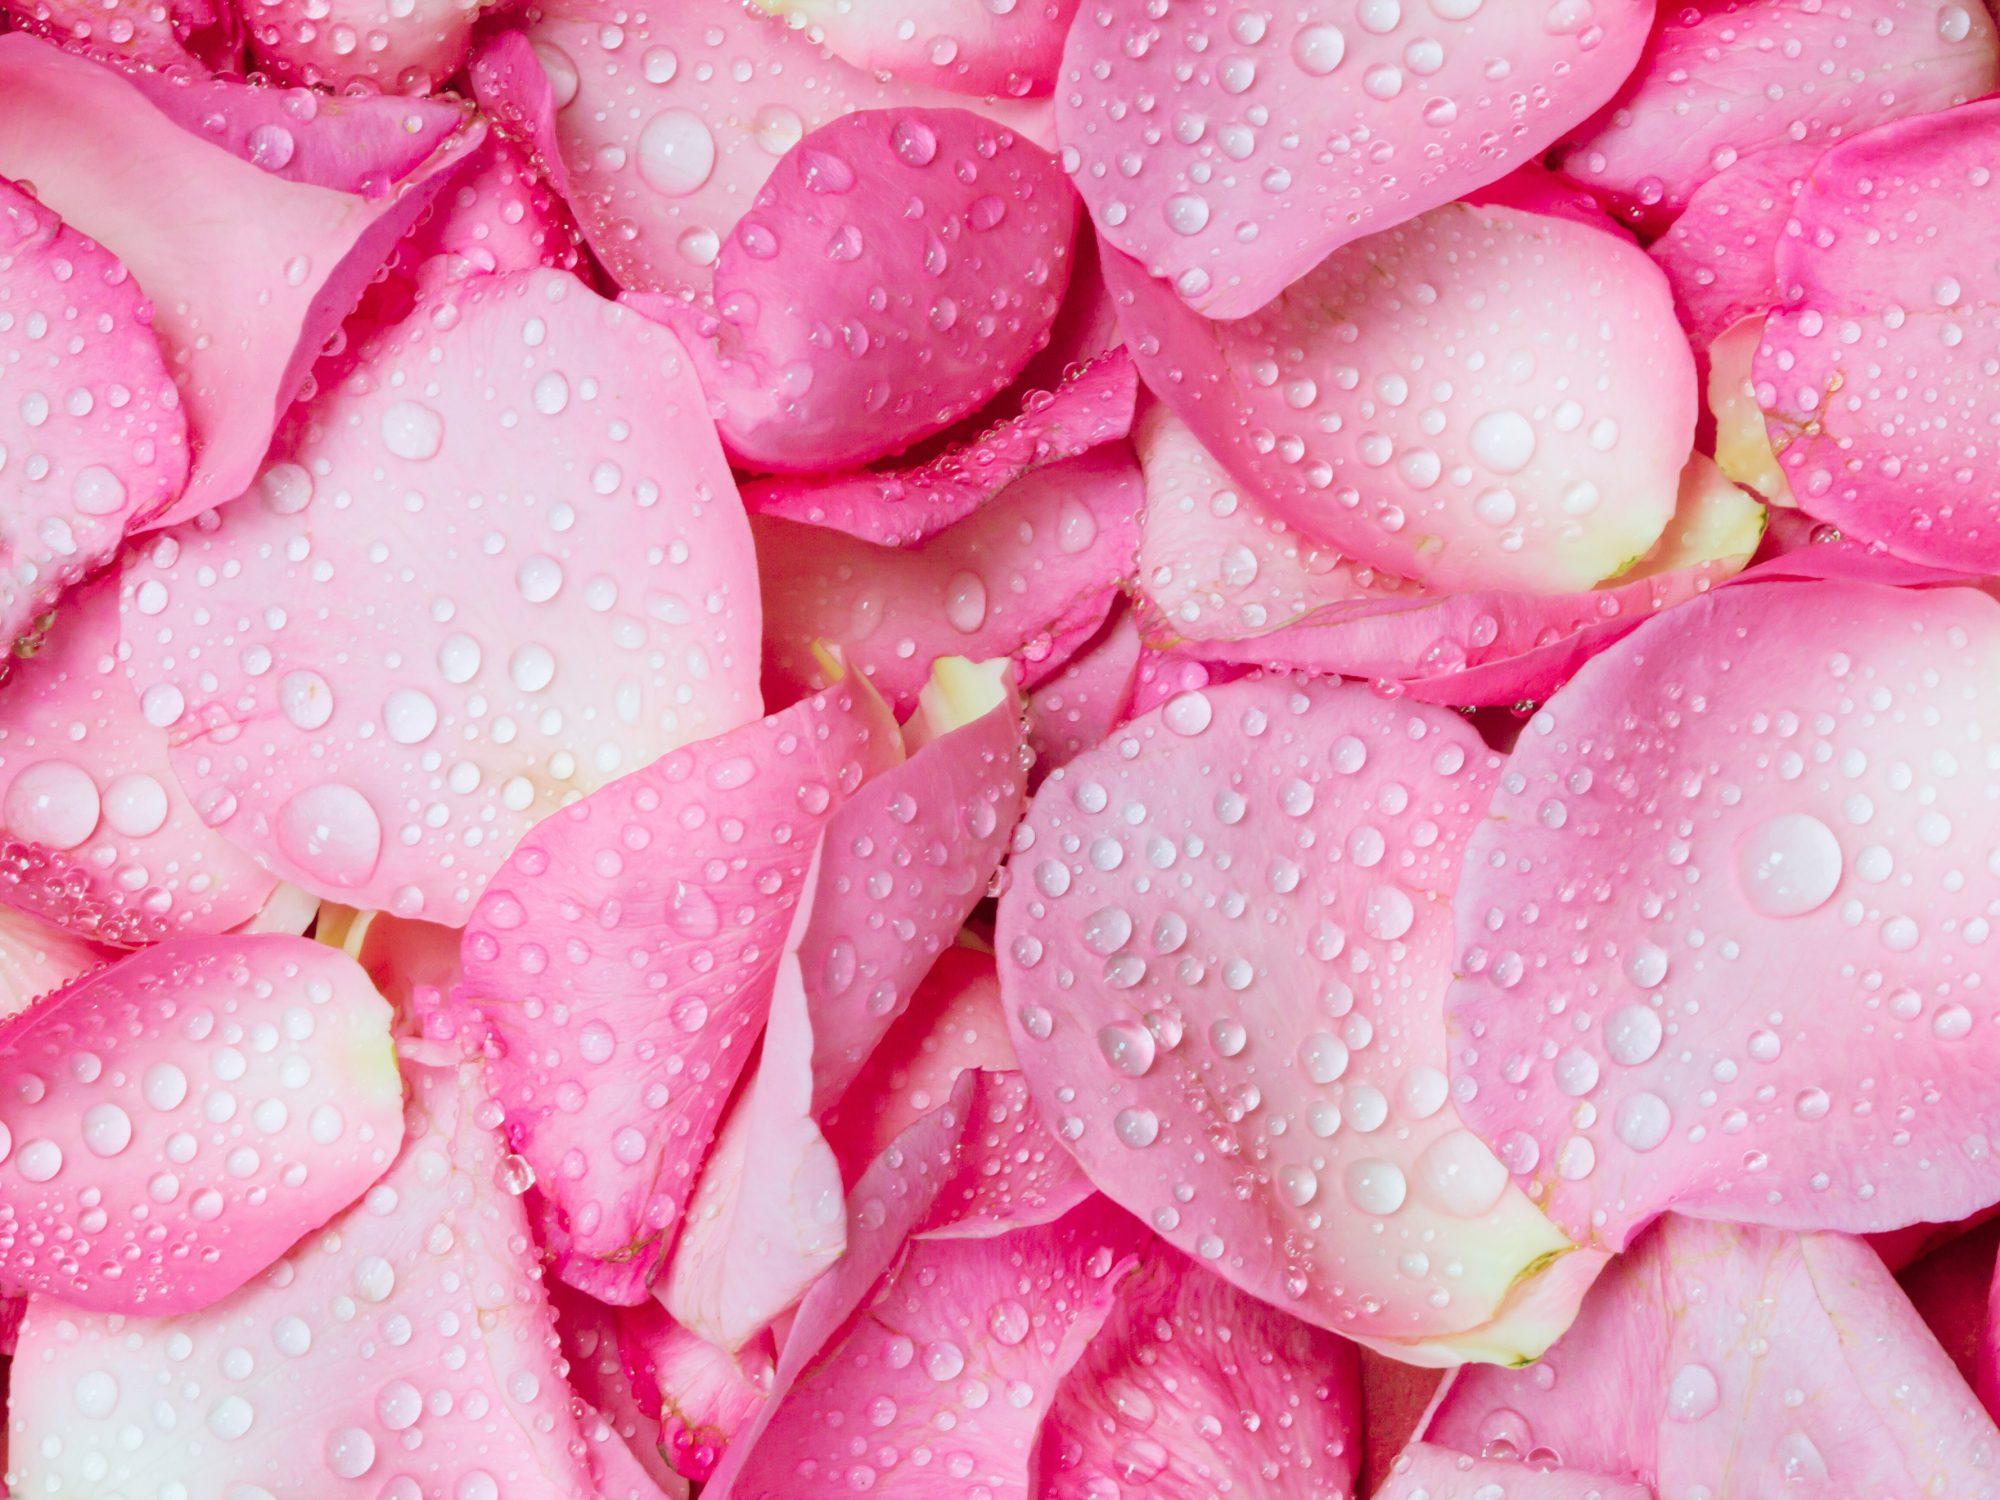 getty-pink-petal-image